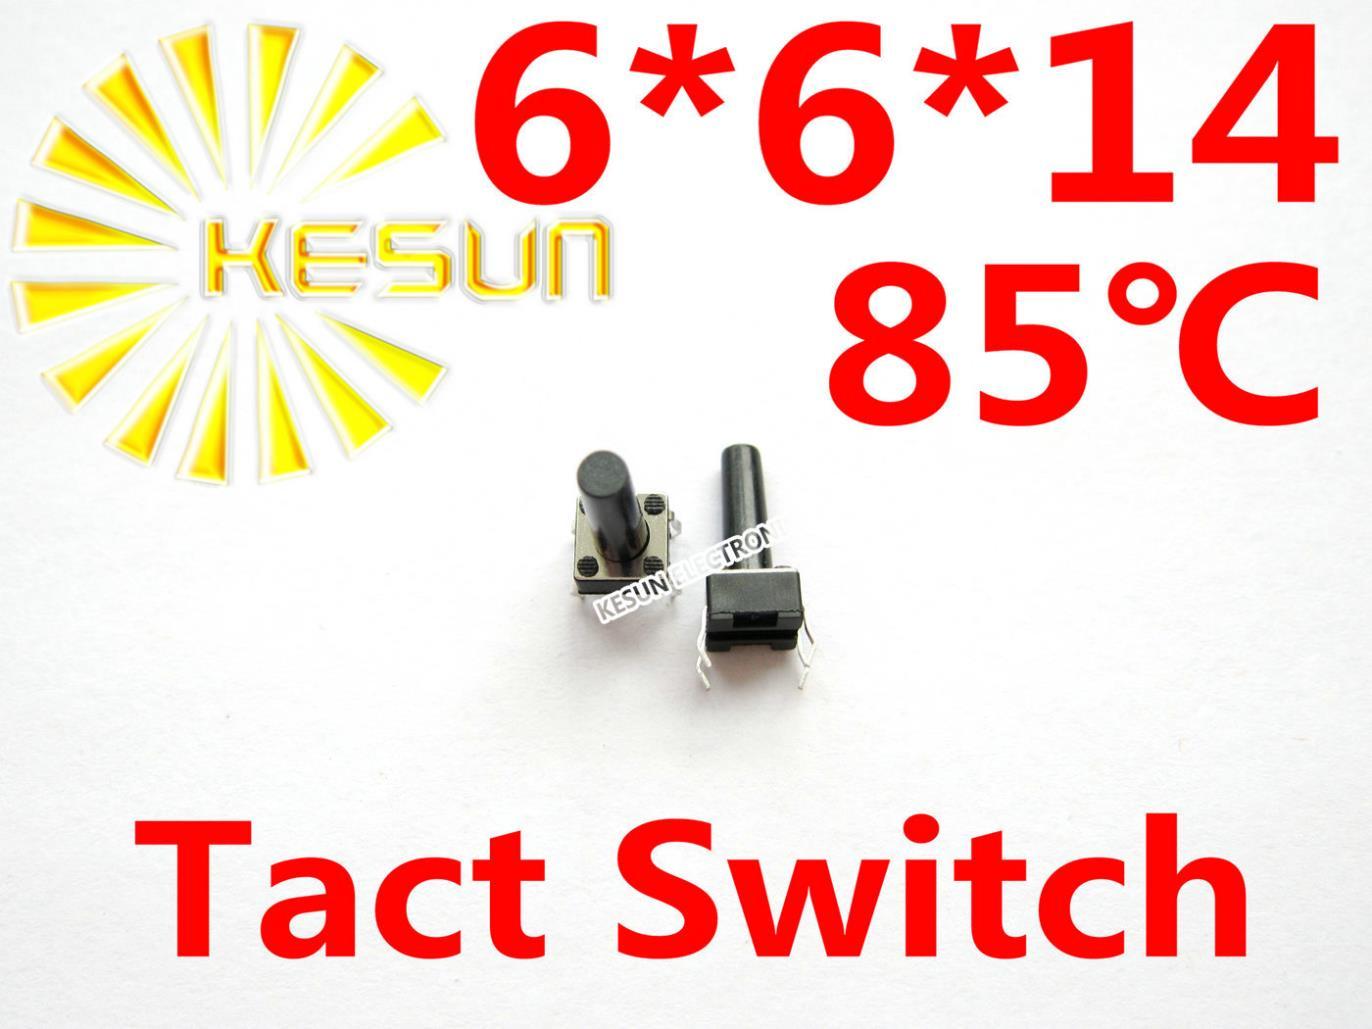 1000 PCS DIP 6X6X14 Tátil Tact Botão Micro Interruptor Momentâneo